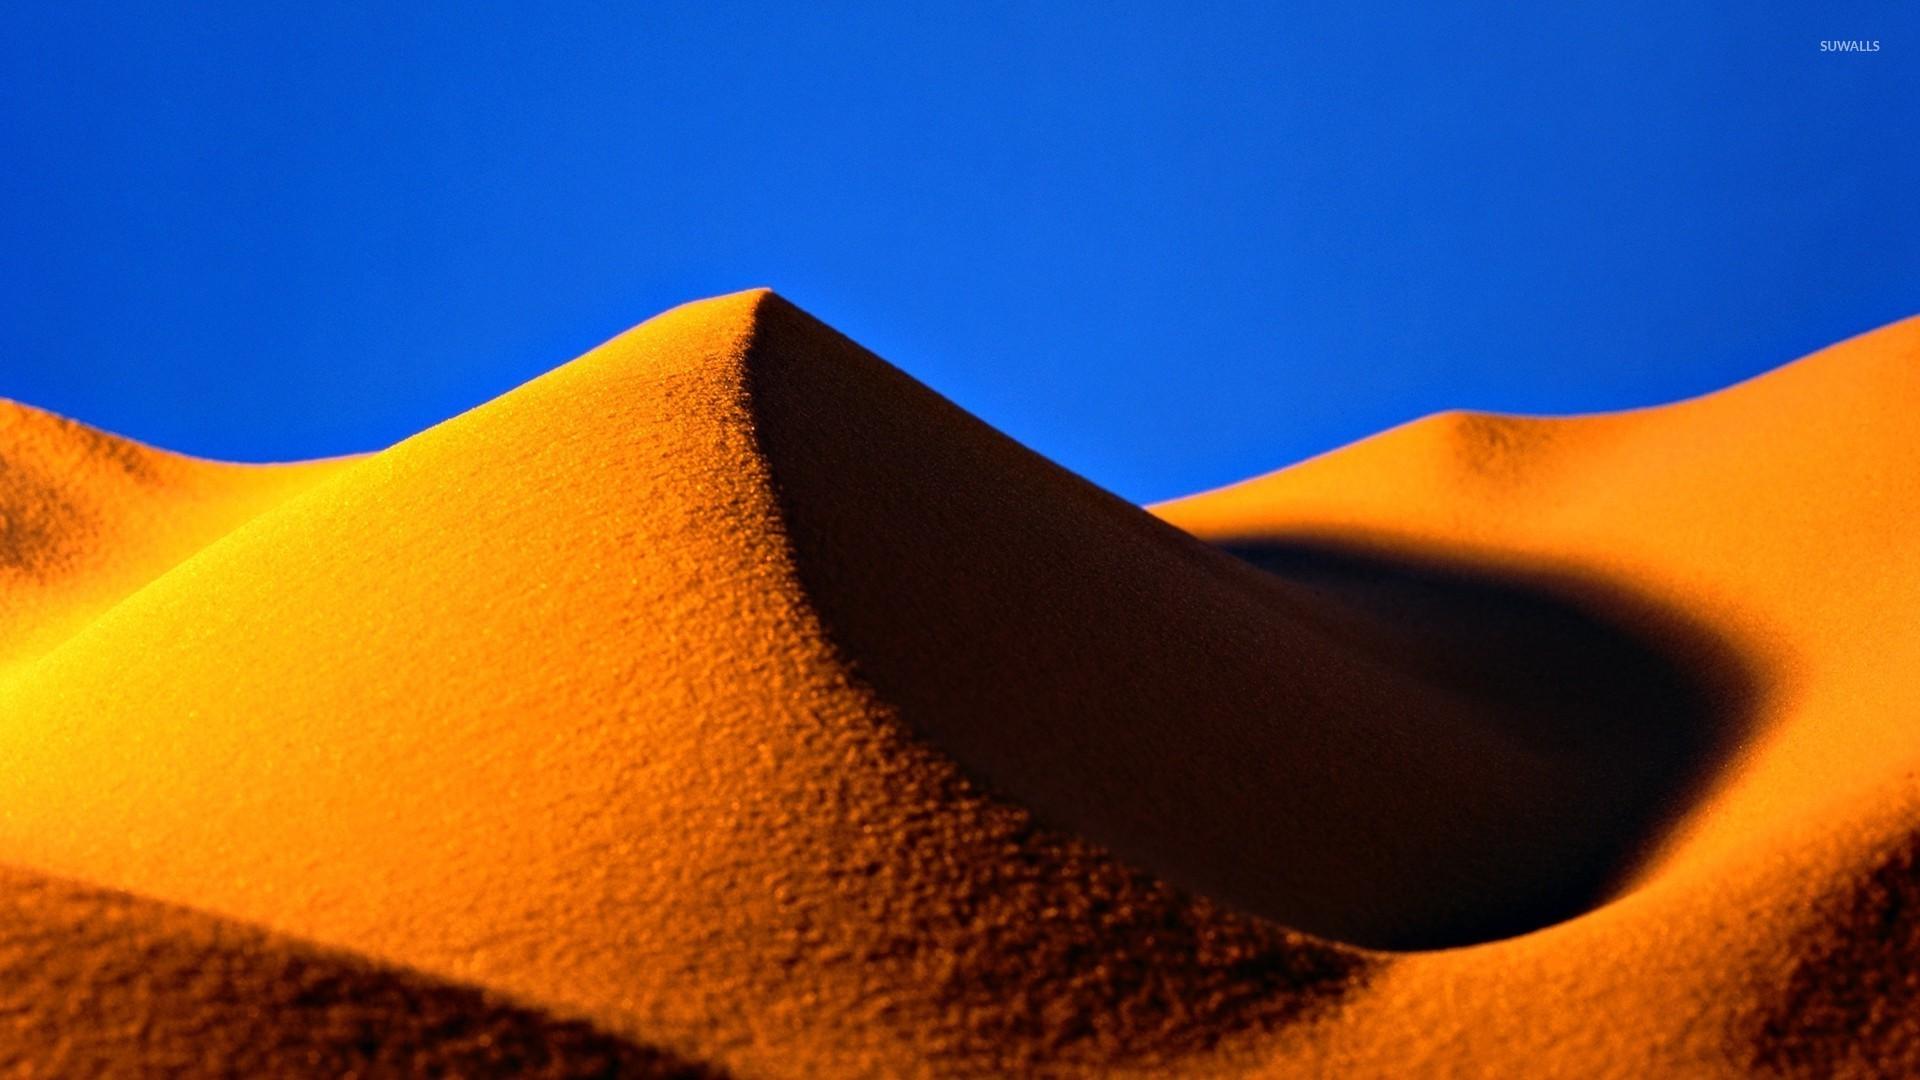 1920x1080 hd wallpaper dune - photo #28